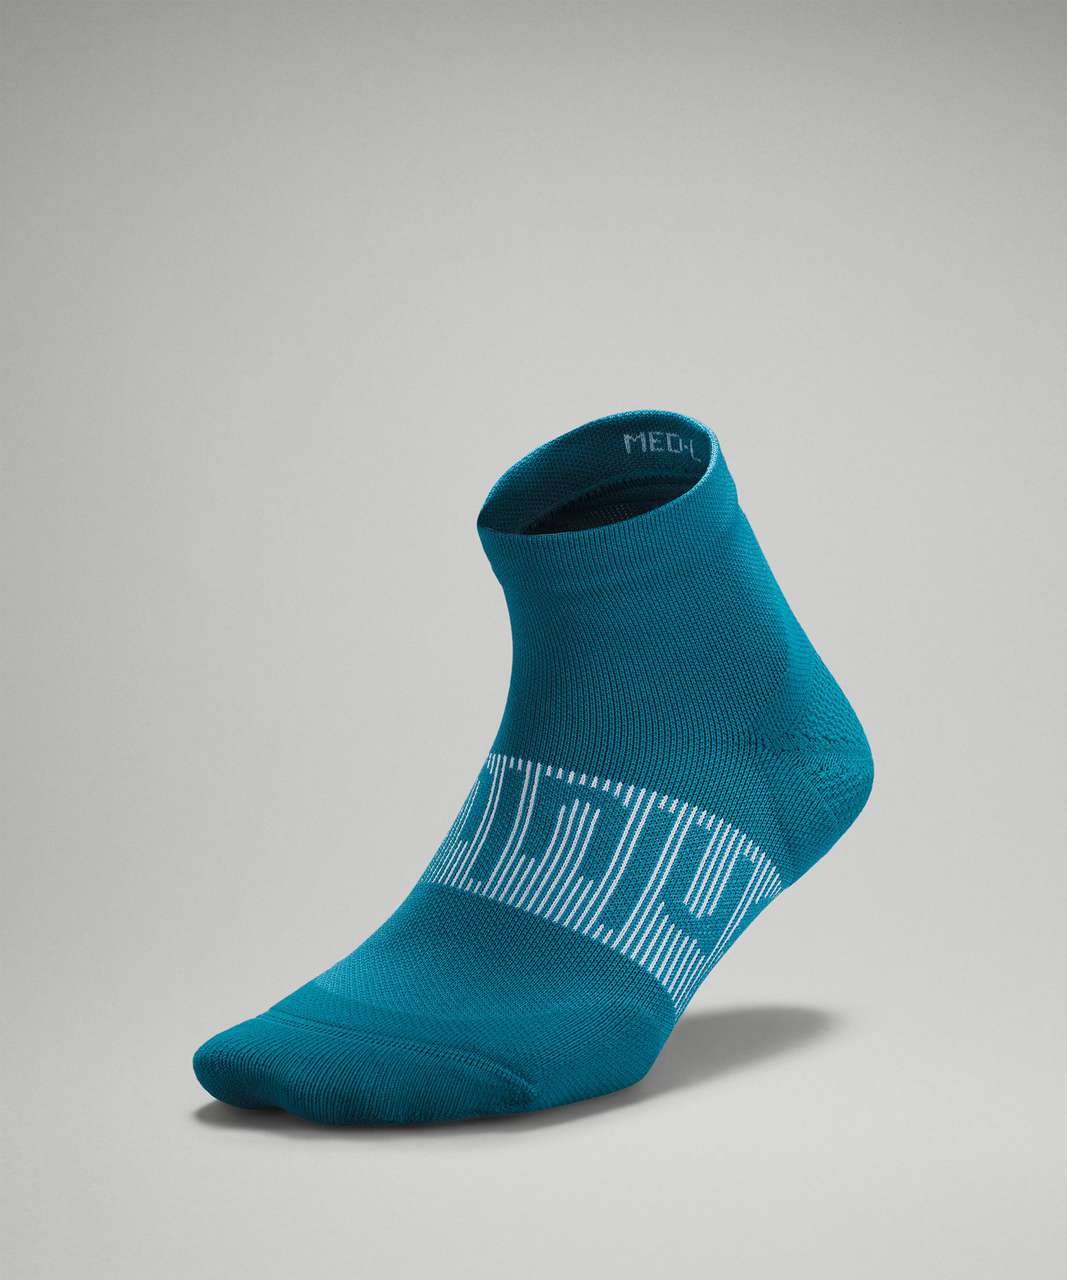 Lululemon Power Stride Ankle Sock - Capture Blue